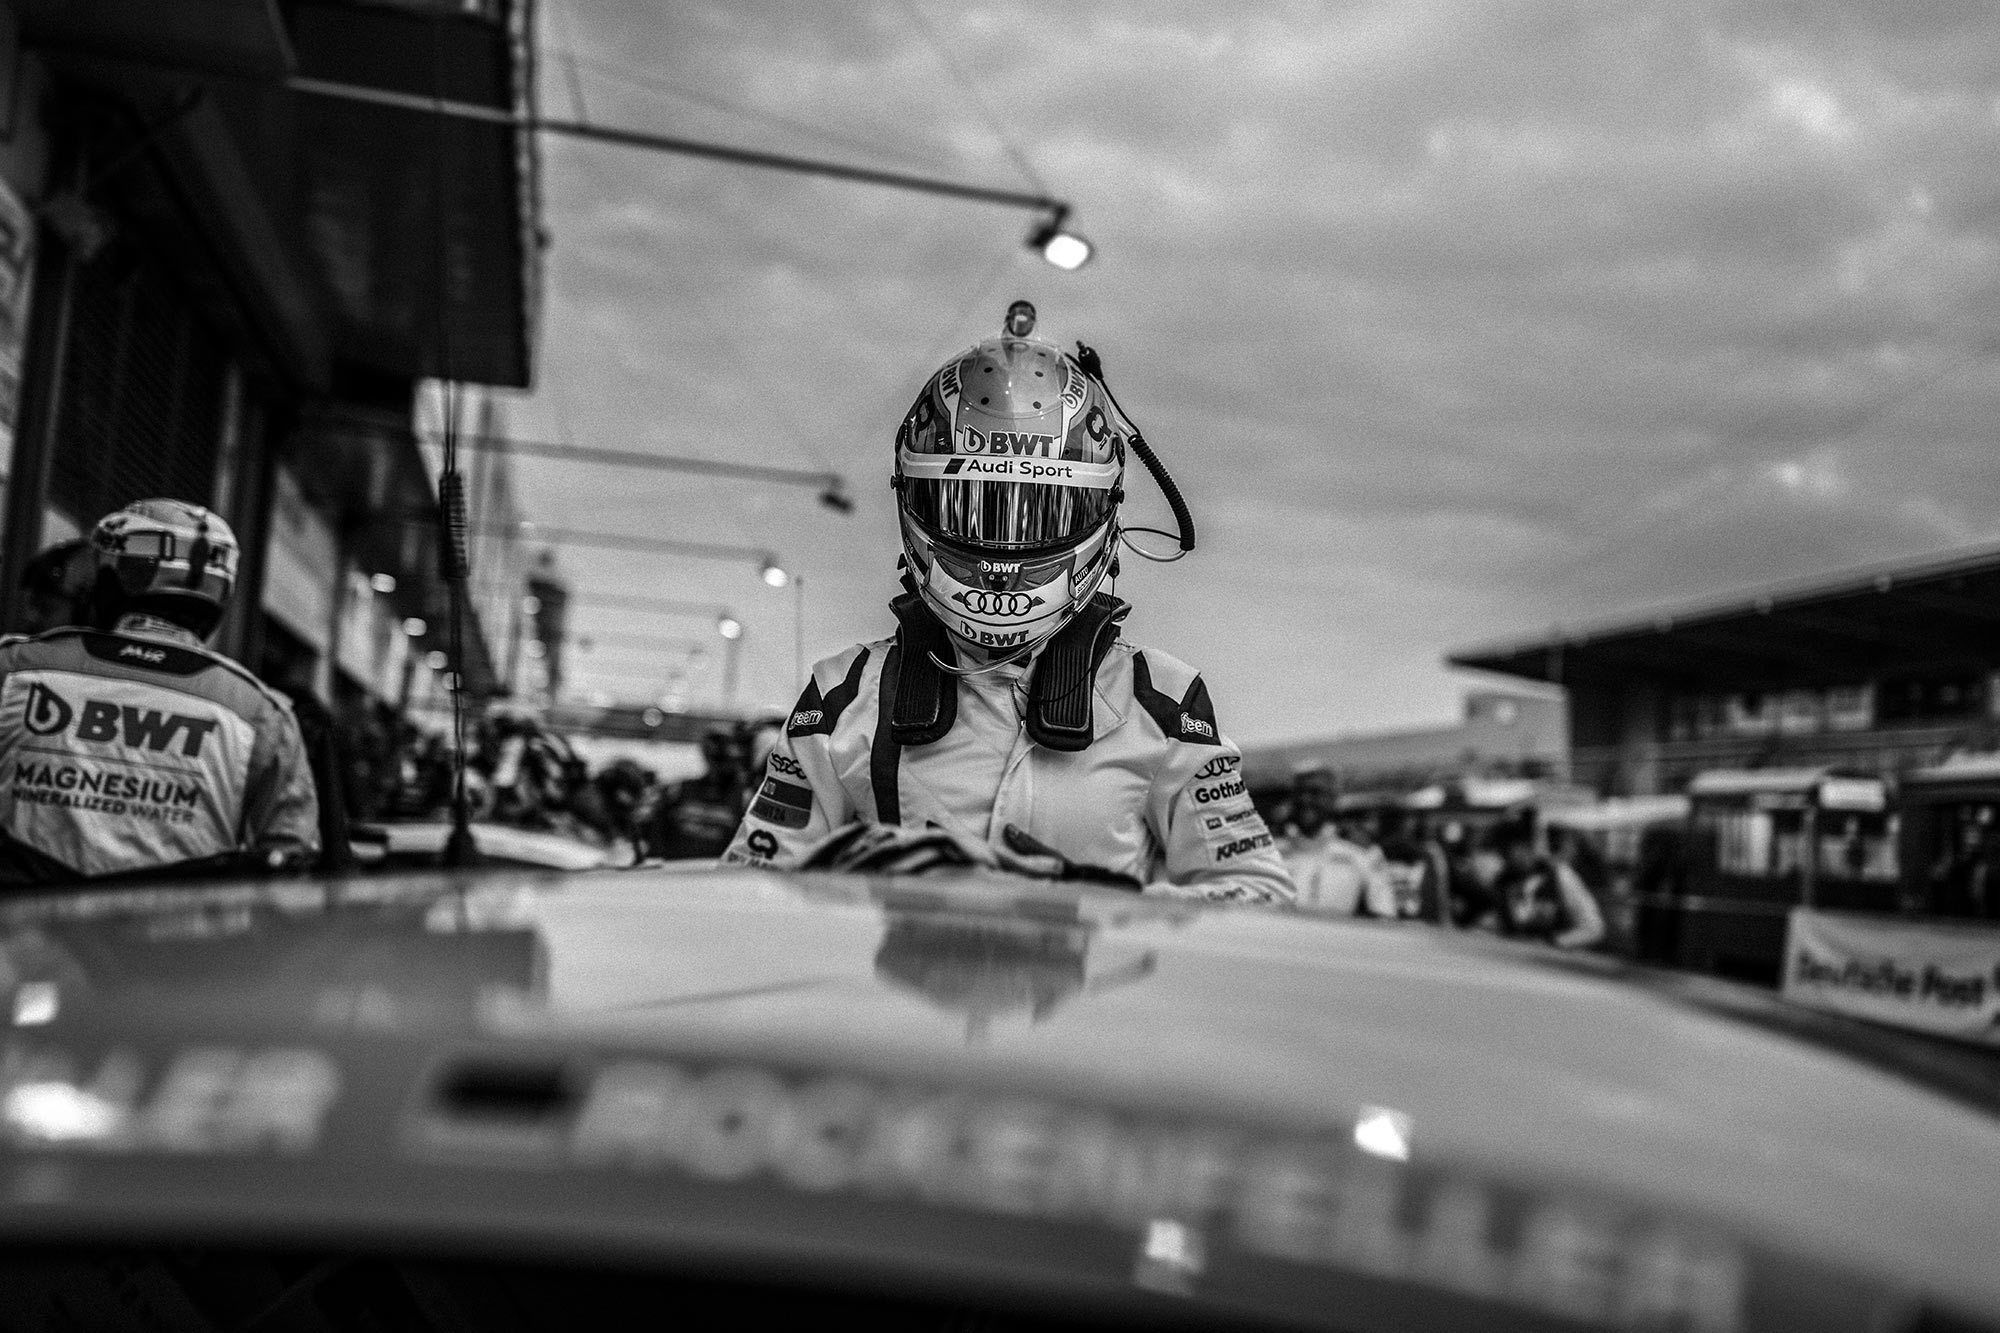 THOMAS SCHORN - BWT MOTORSPORT / REPRESENTED BY BANRAP